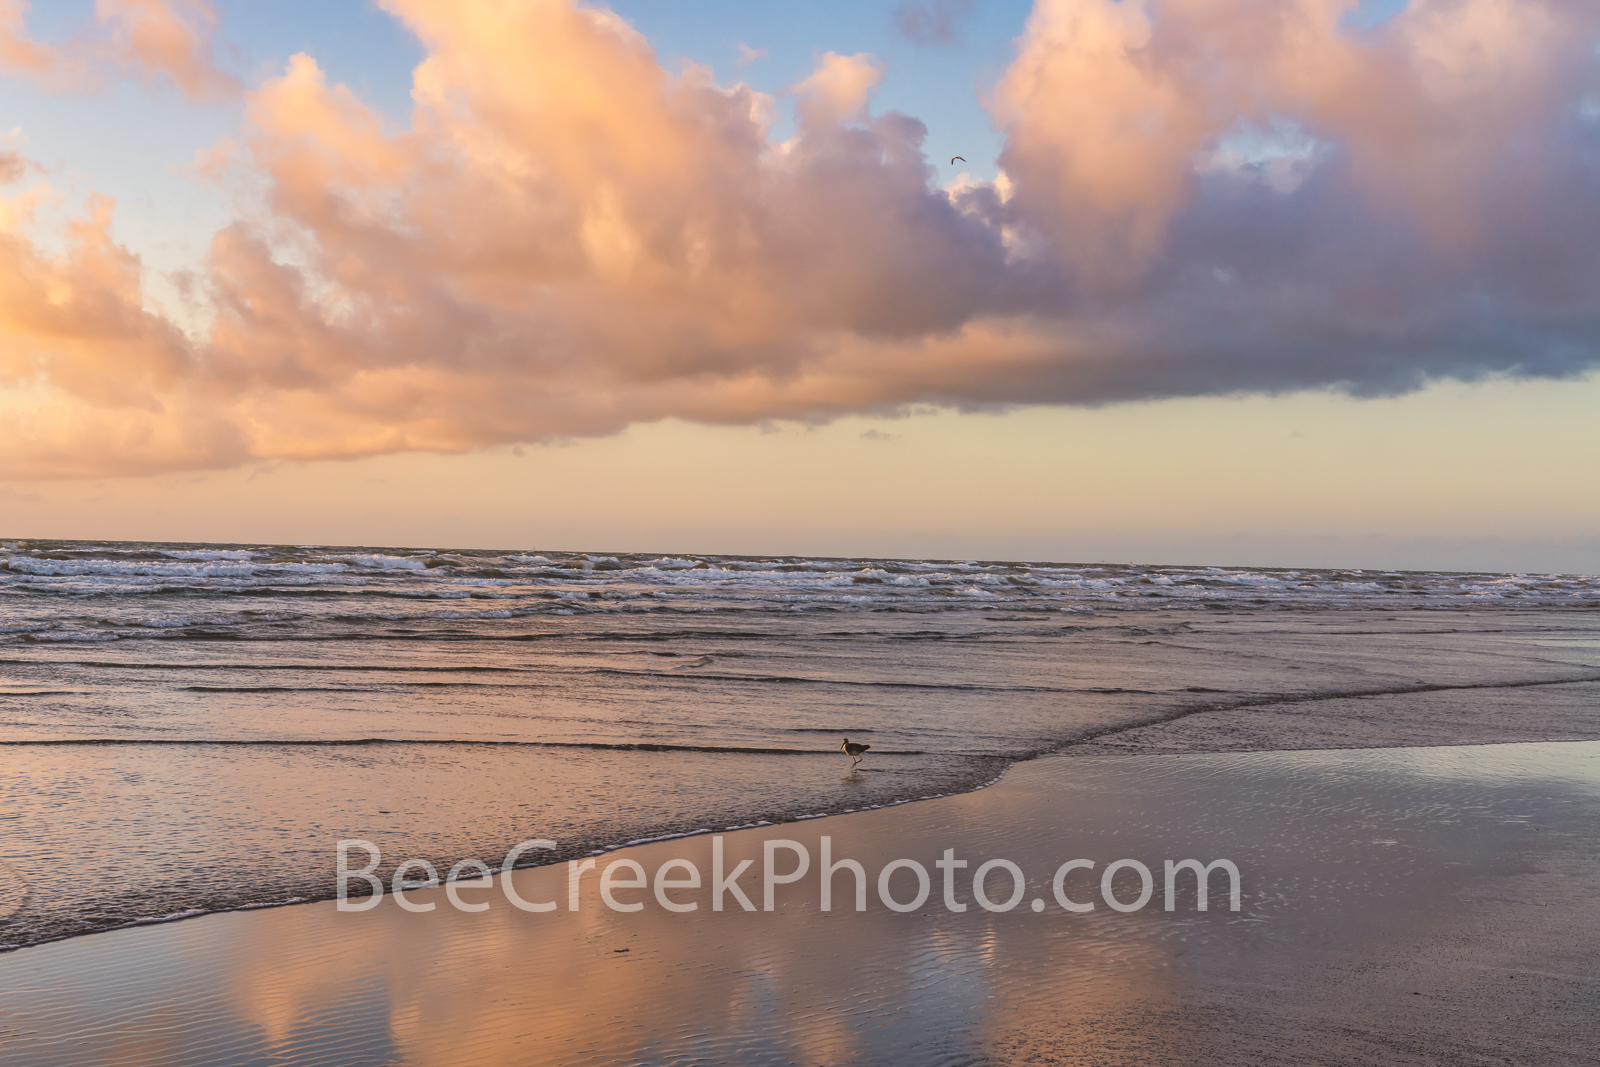 port aransas, beach, beach,  clouds, gulf of mexico, port a, sea, ocean, peach, pinks, orange, reflections, reflect, bird, beautiful, pastel, colors, colorful, seascape, beach scene, texas coast, coas, photo